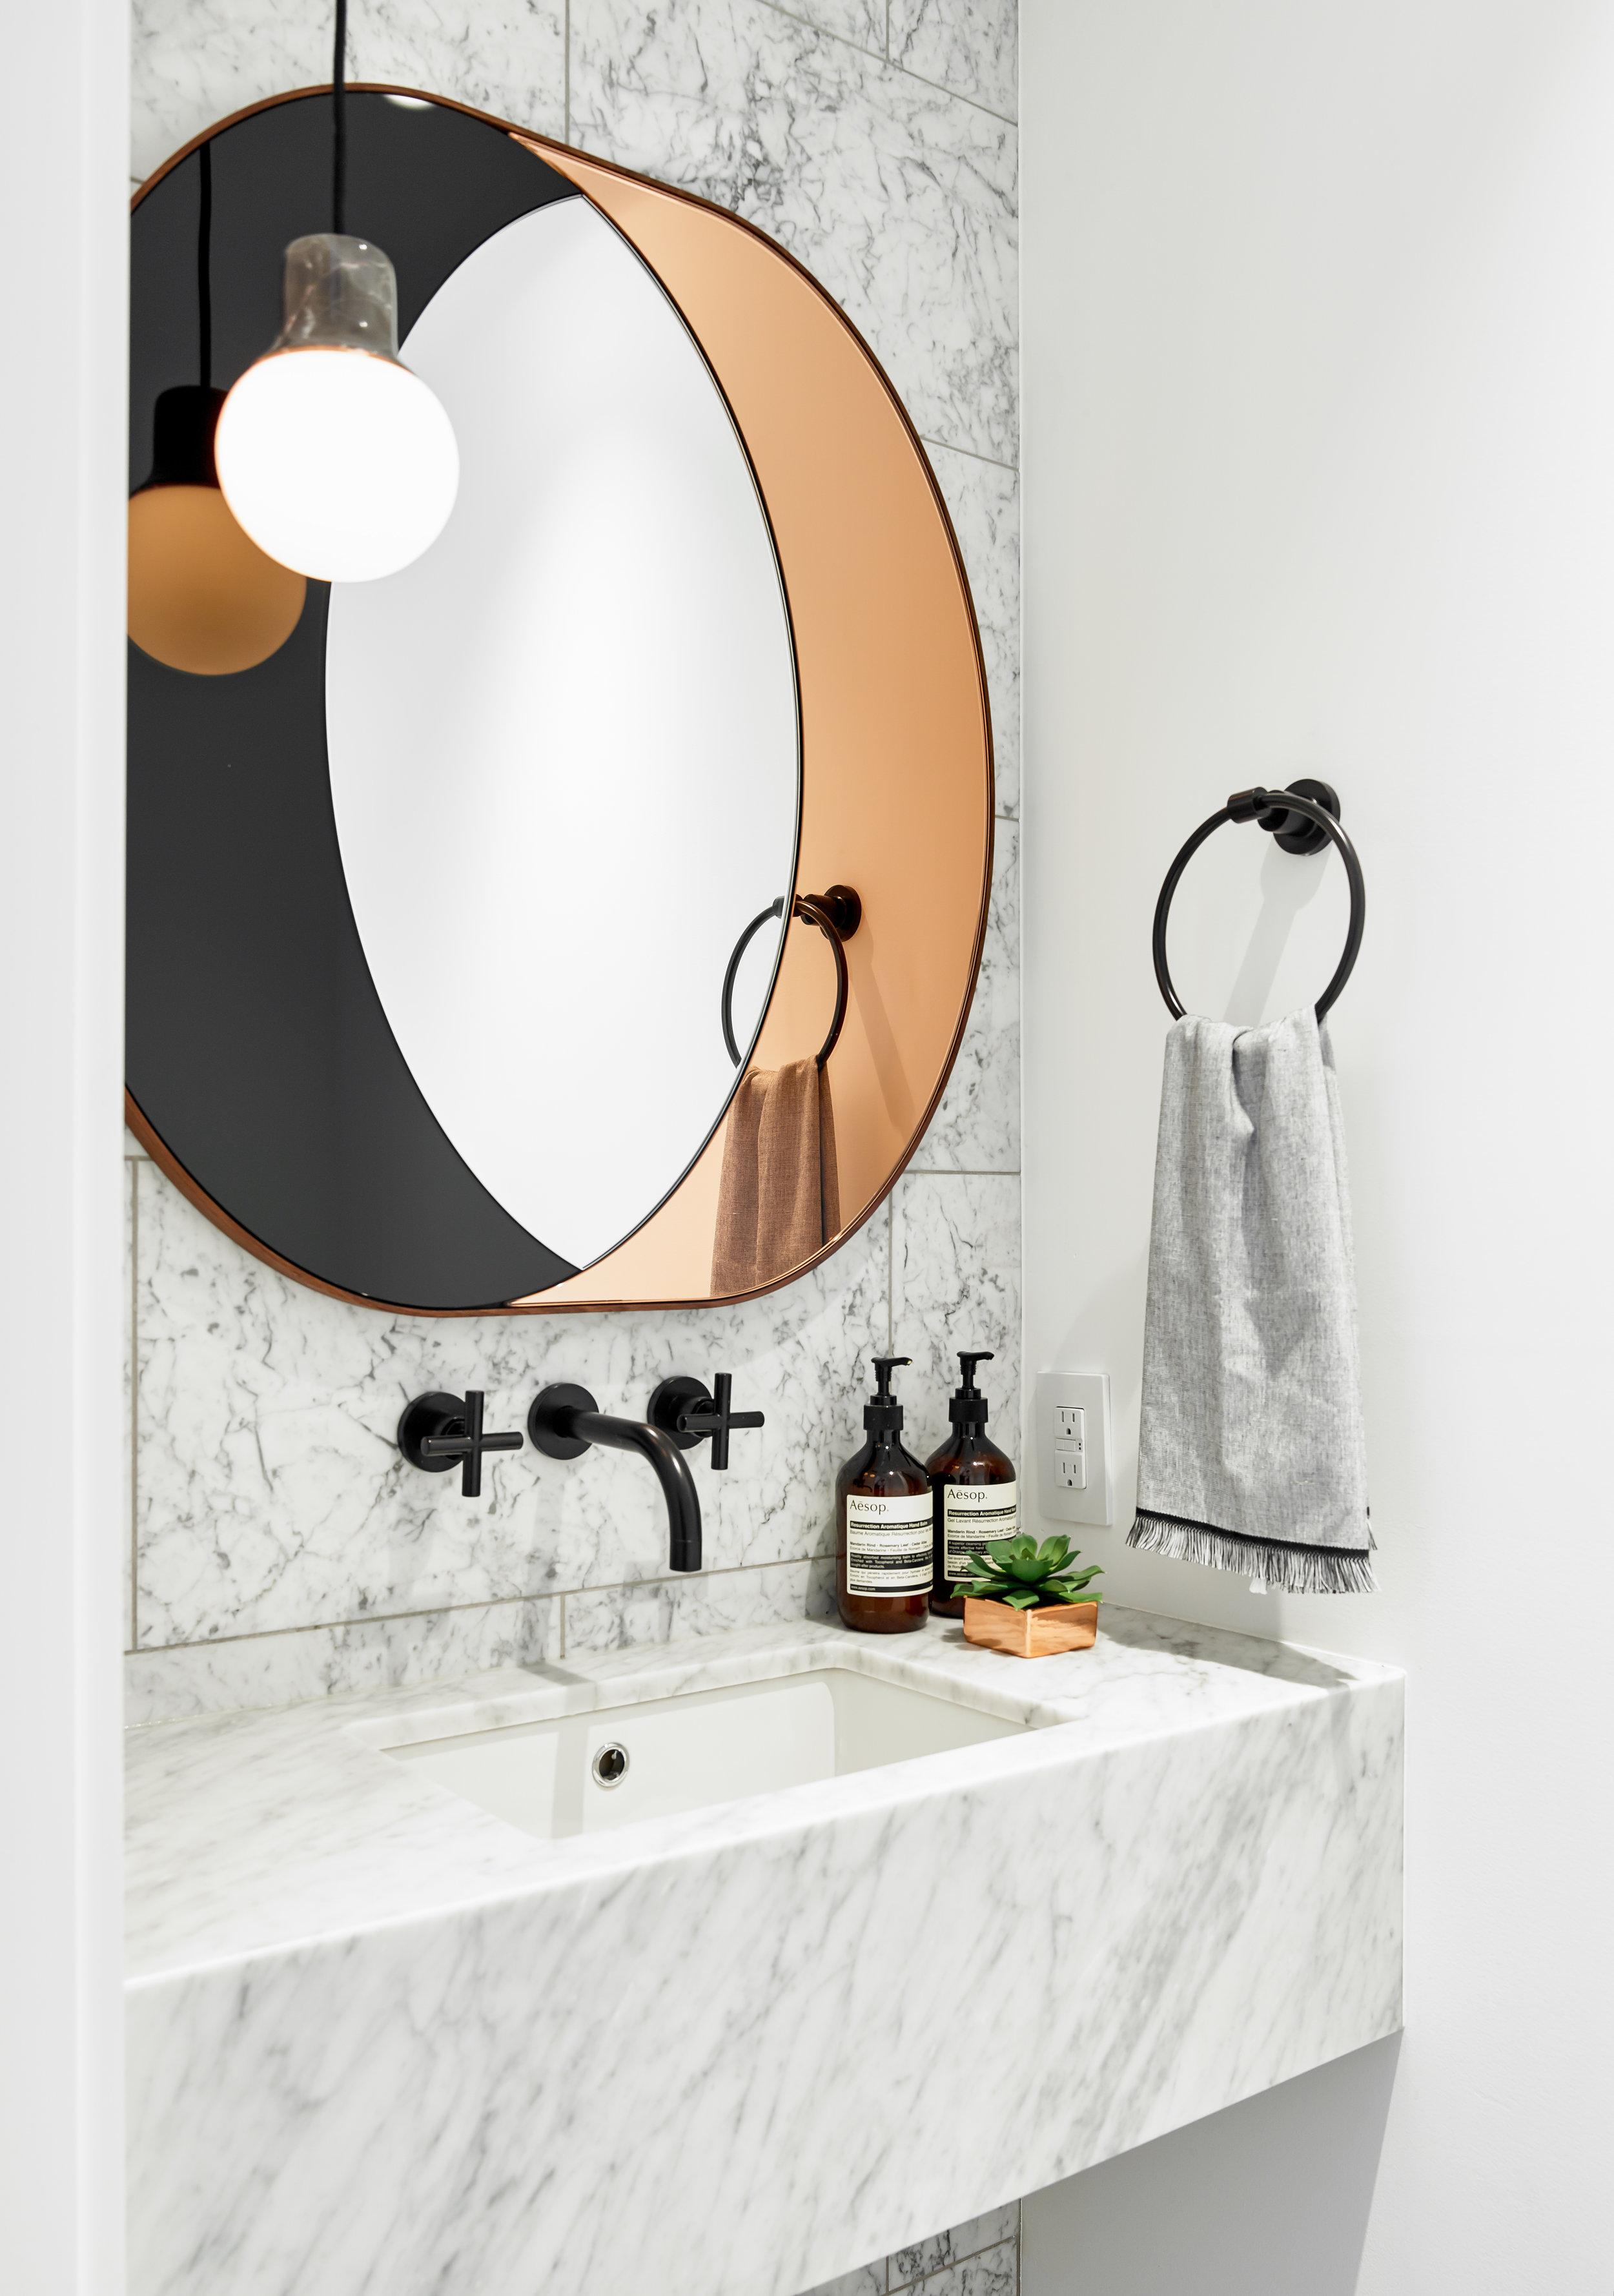 Walker Guest Bathroom Sink